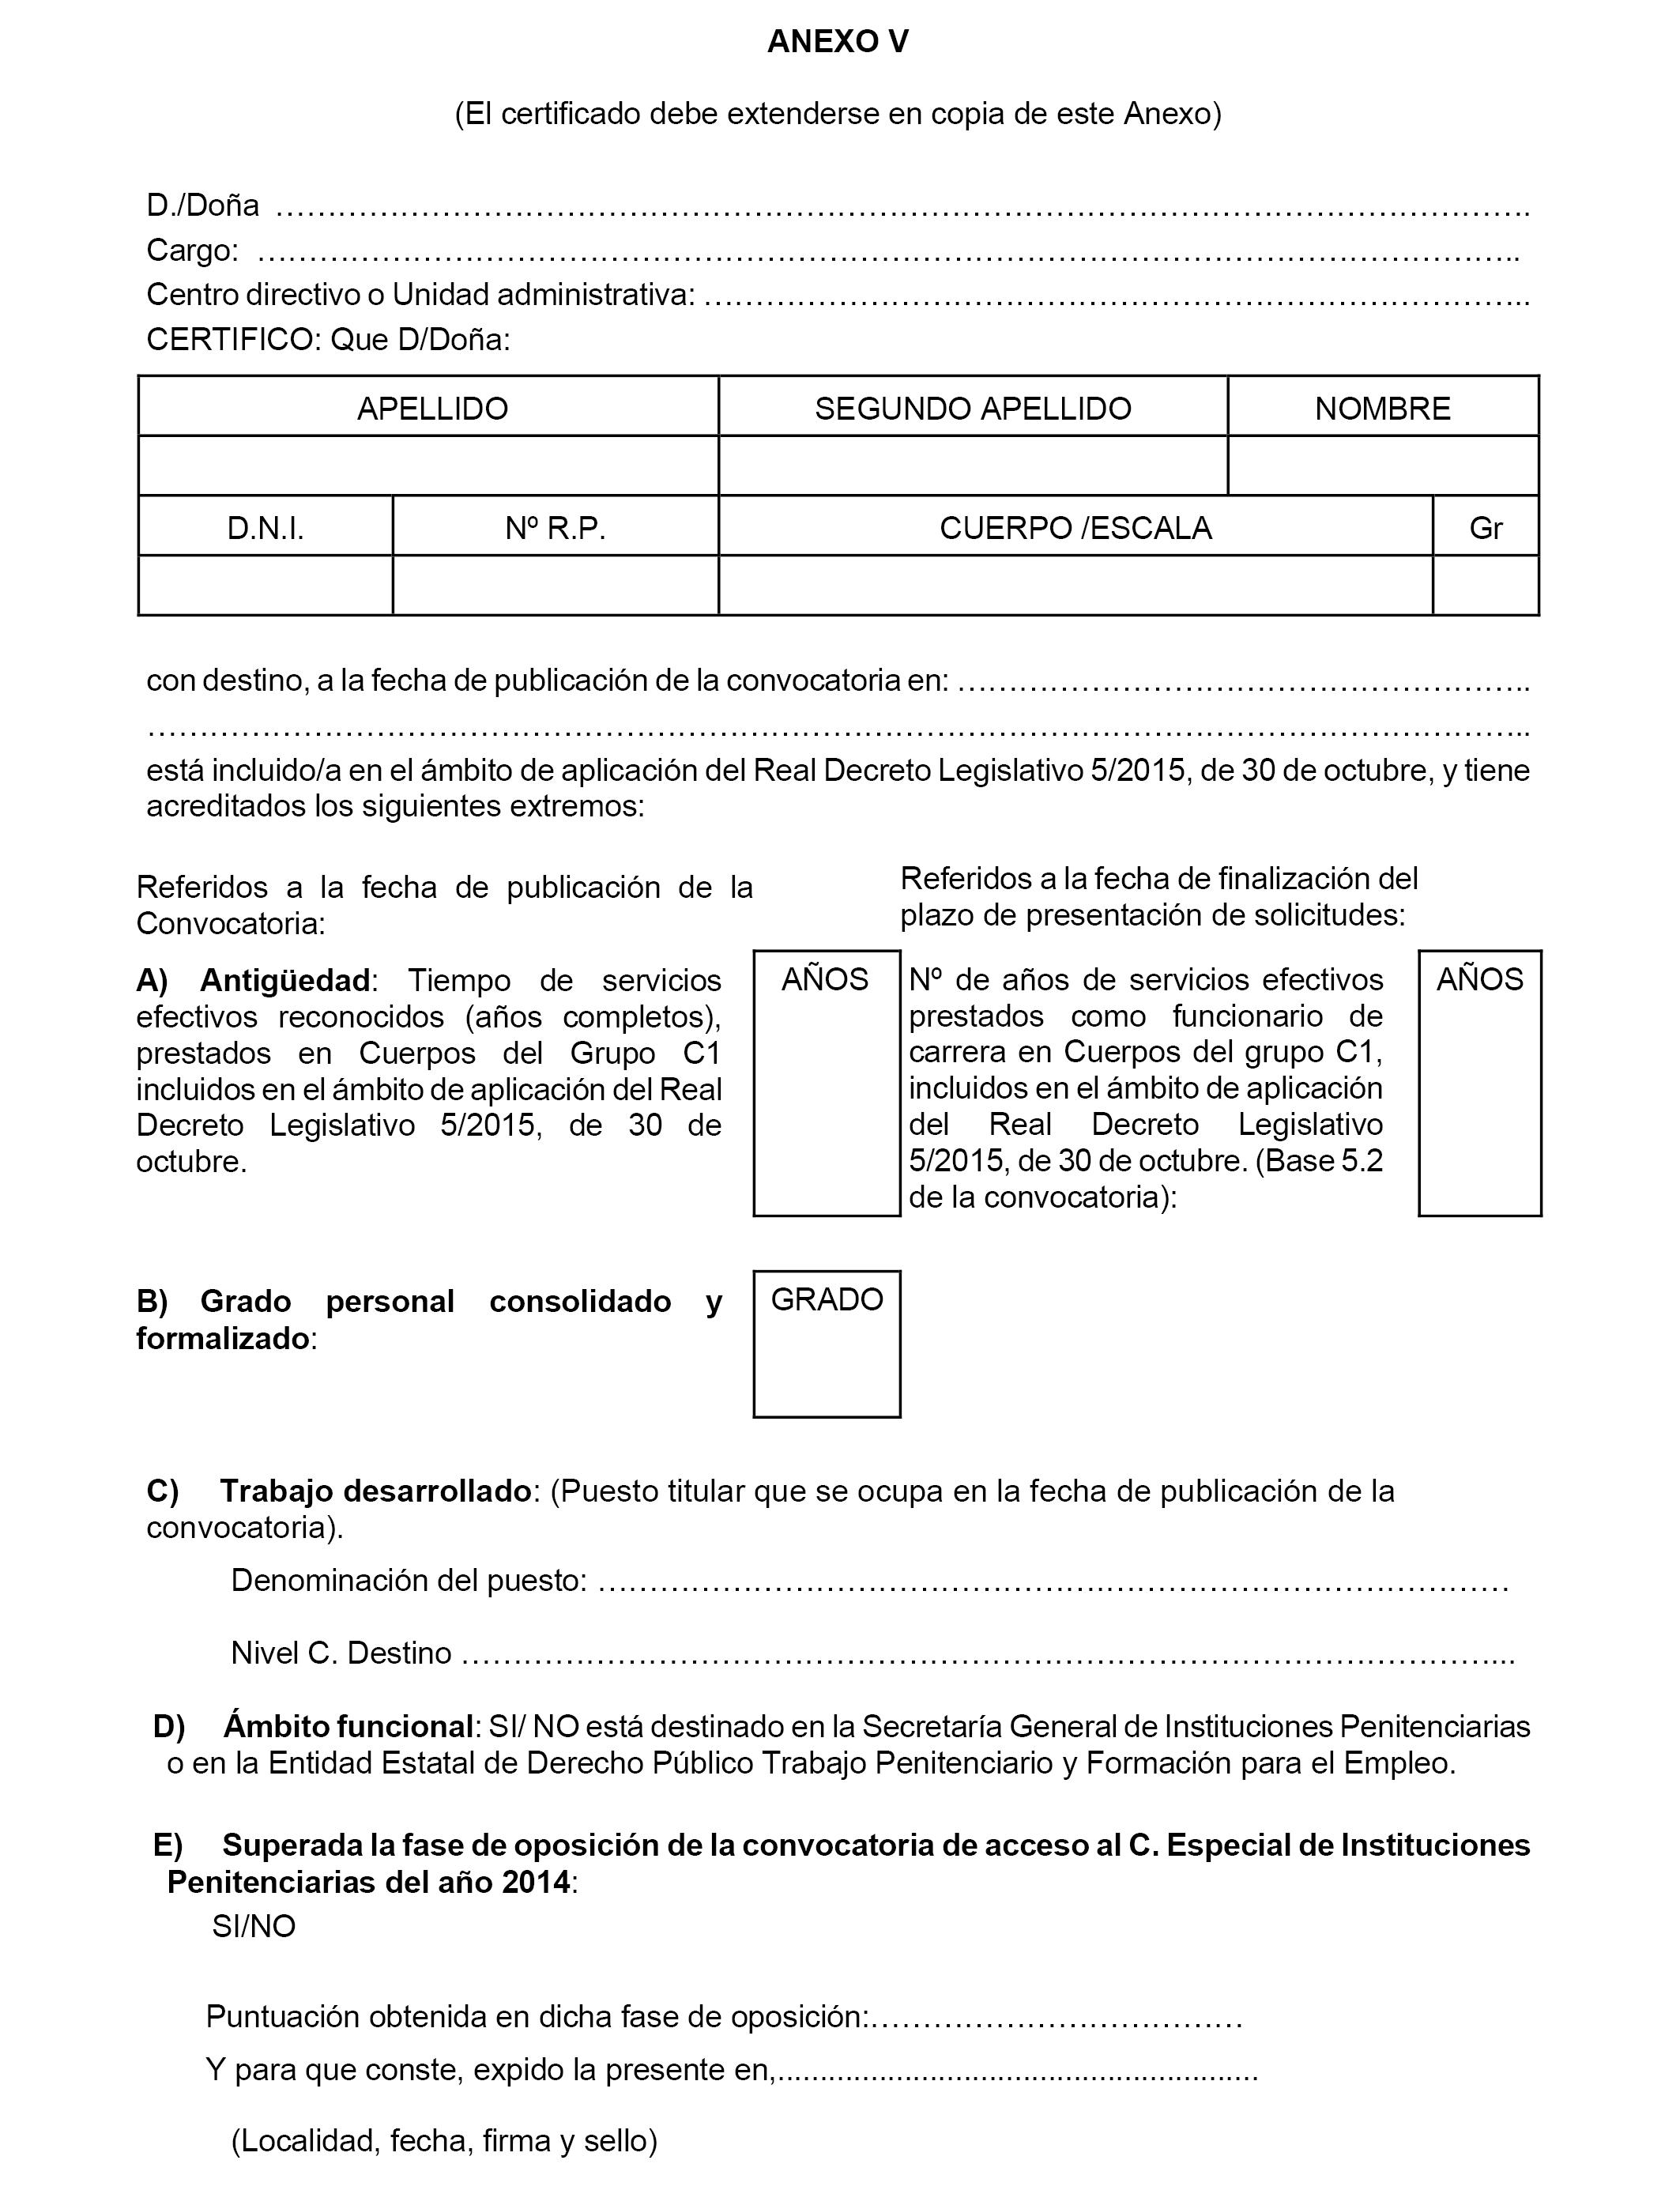 BOE.es - Documento BOE-A-2017-7918